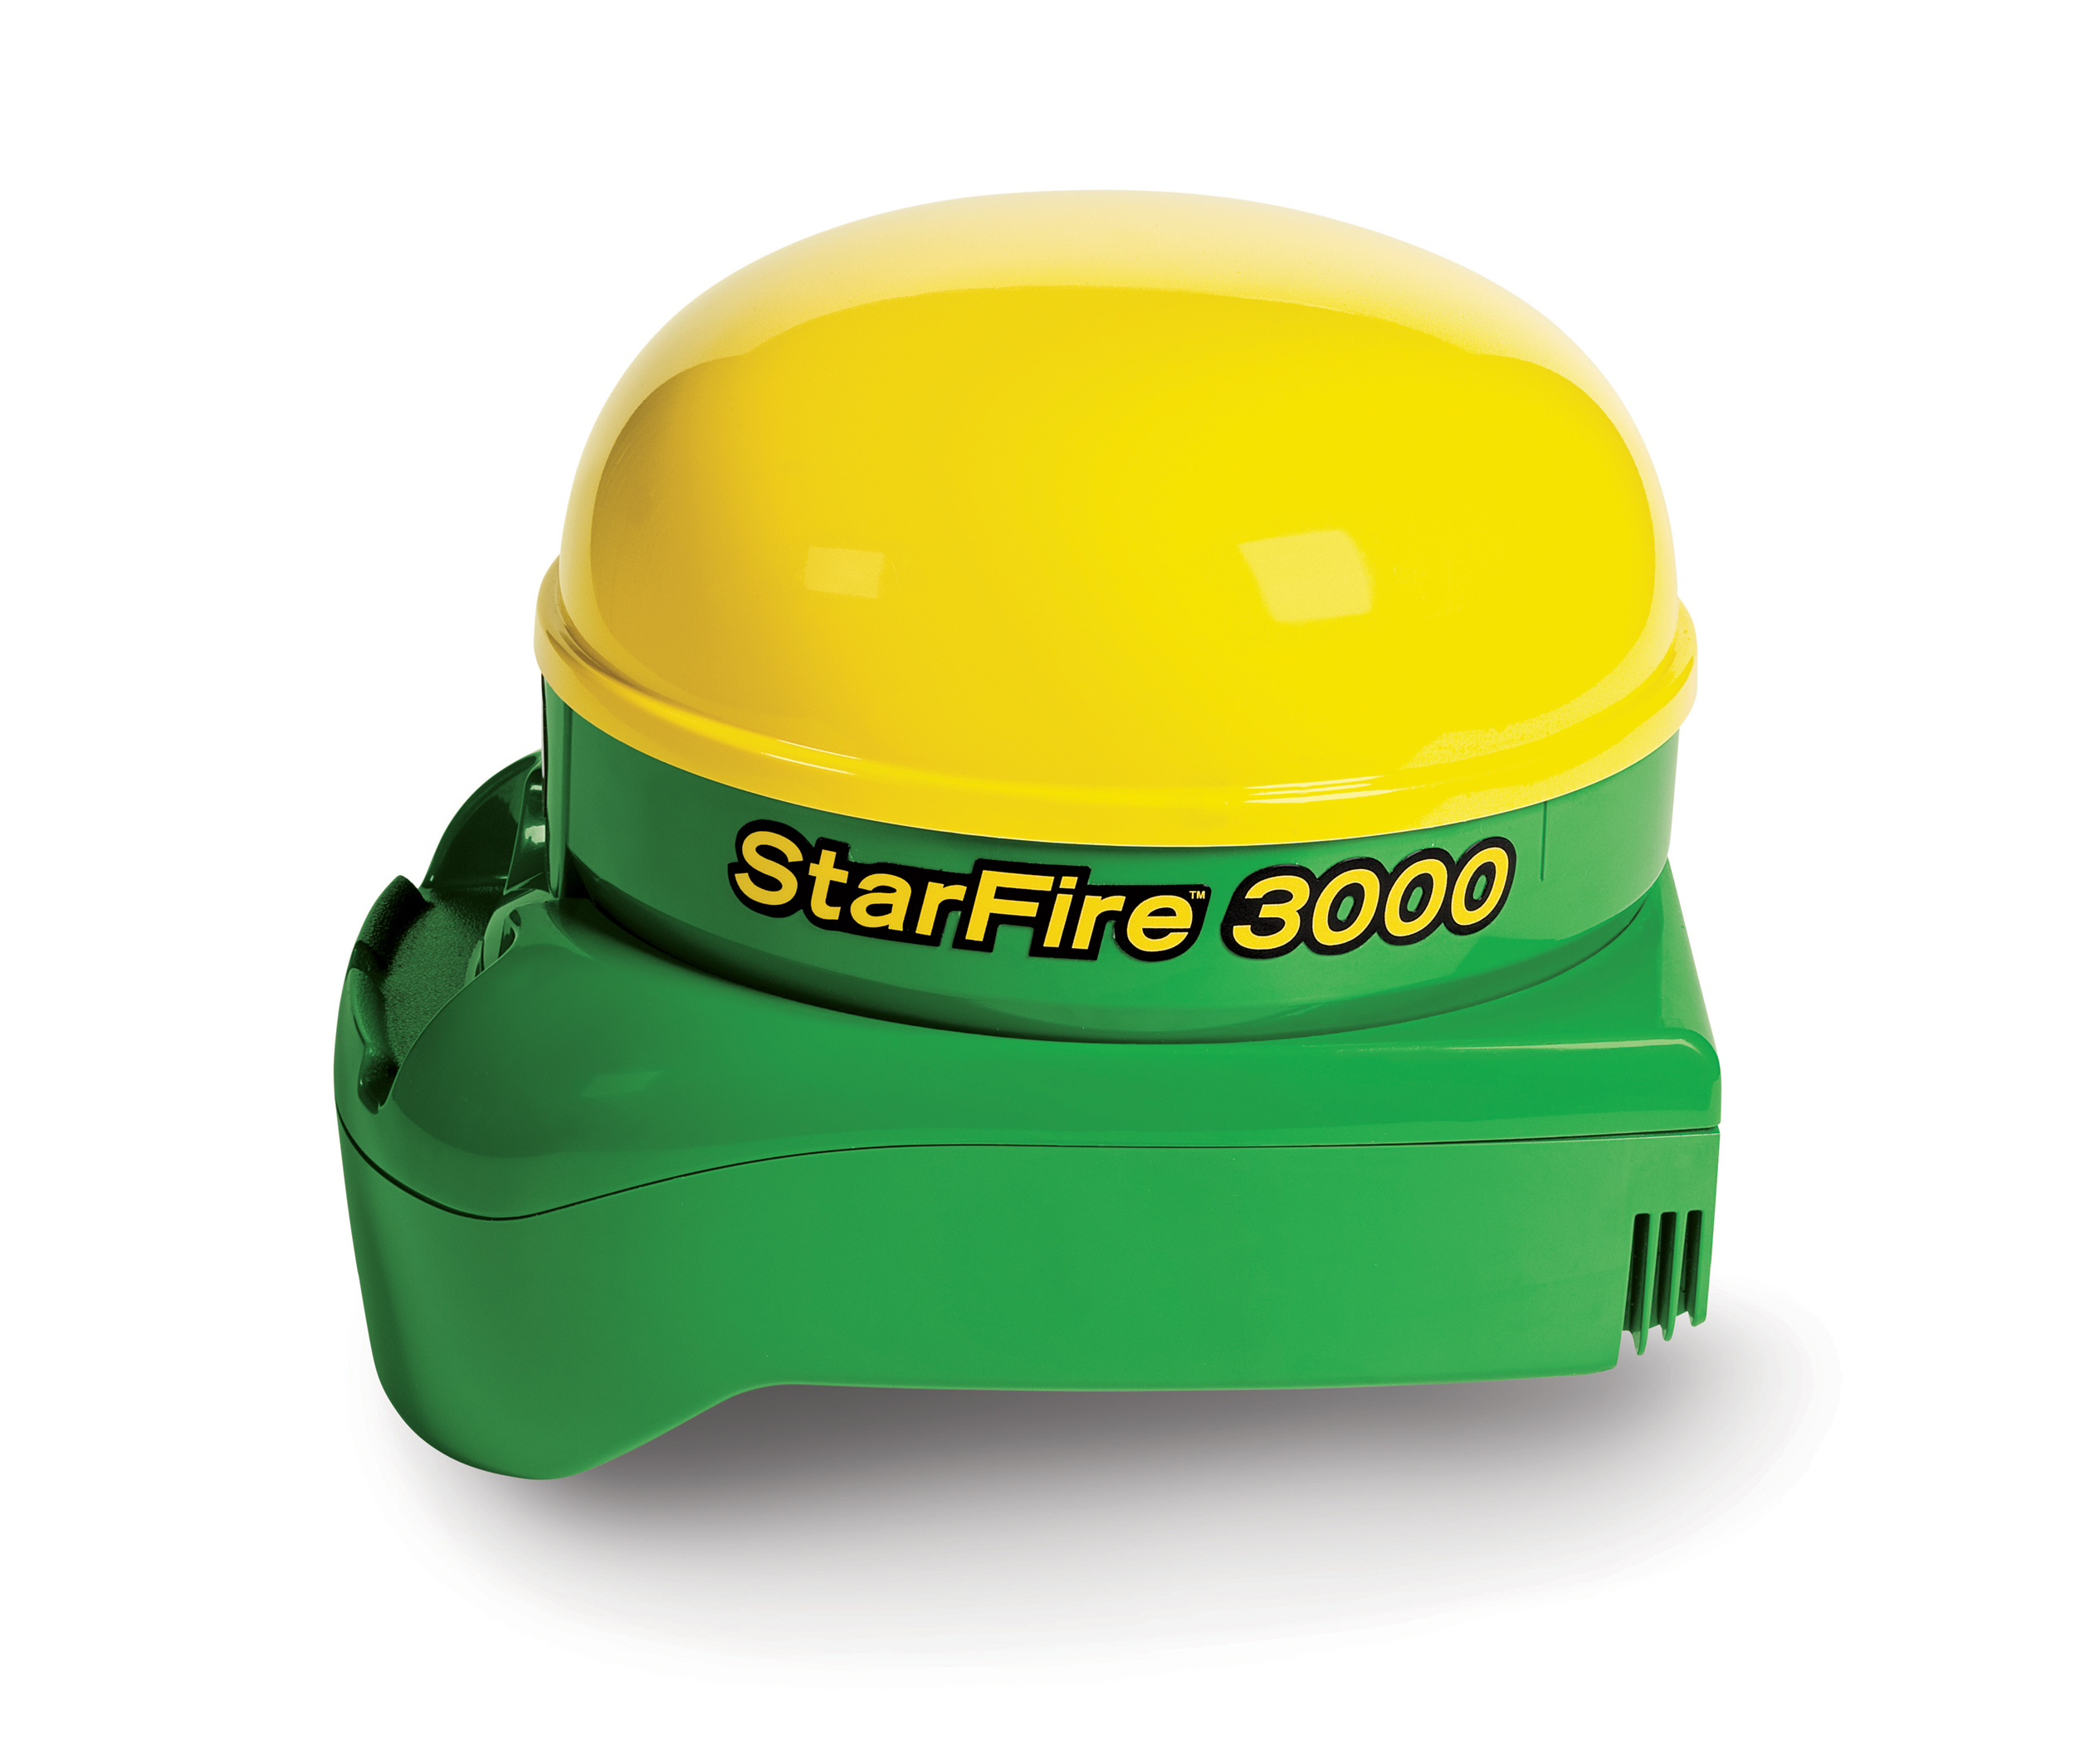 Auto steer gps john deere greenstar starfire 3000 rtk reciever 2600